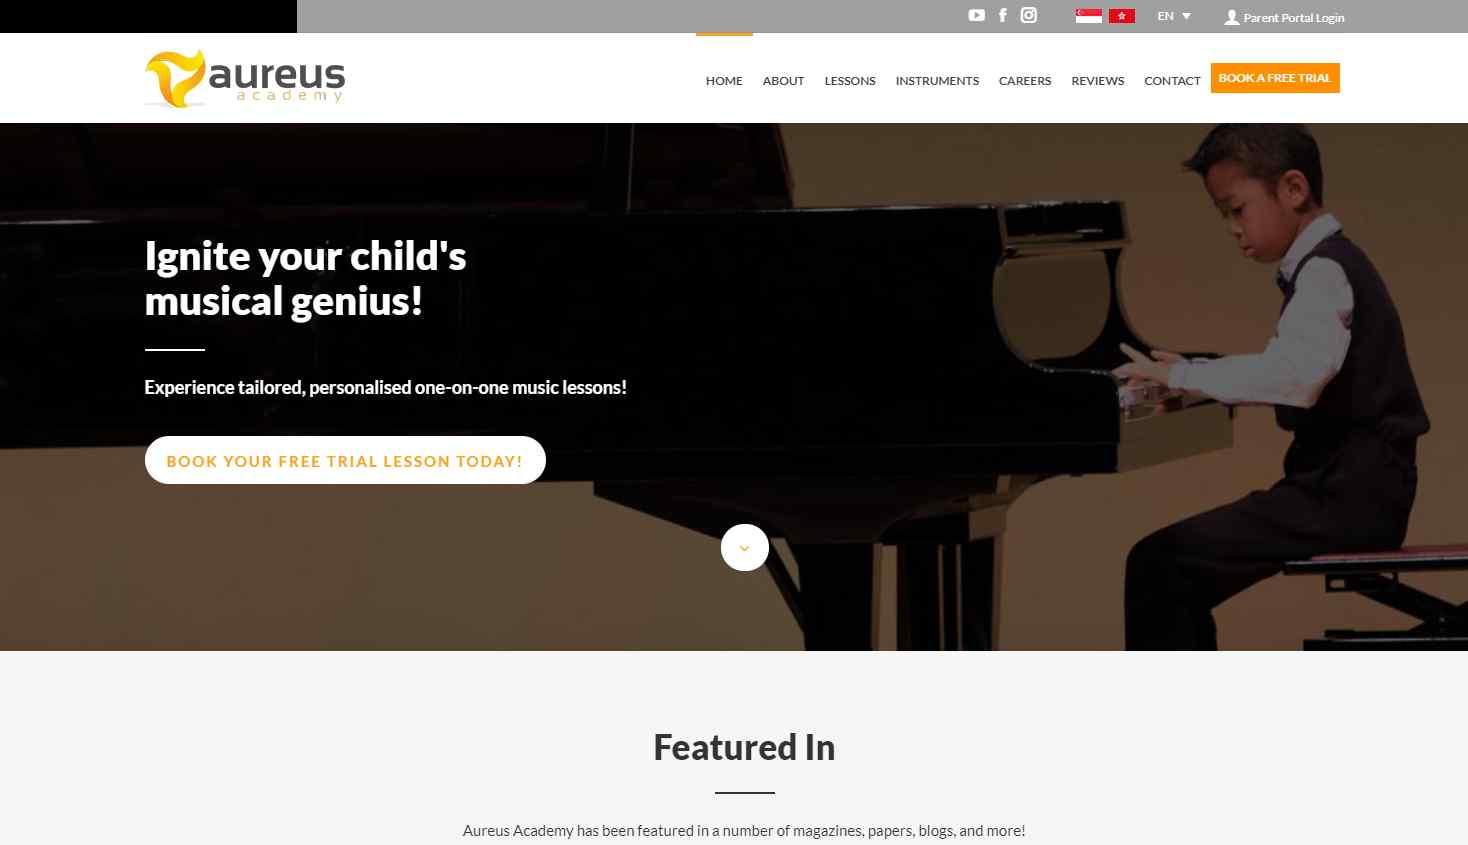 aureusa academy Top Music Schools in Singapore